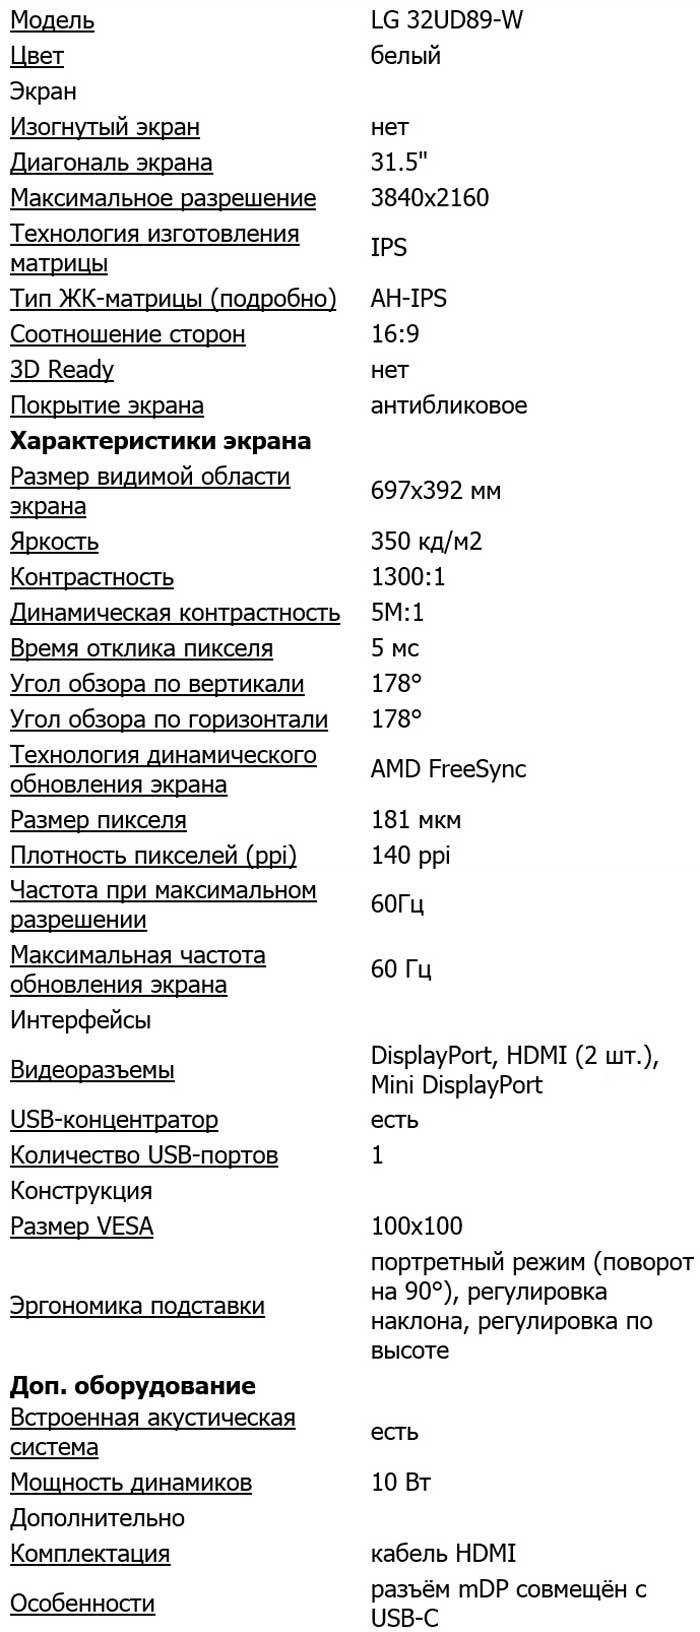 Характеристики 32UD89